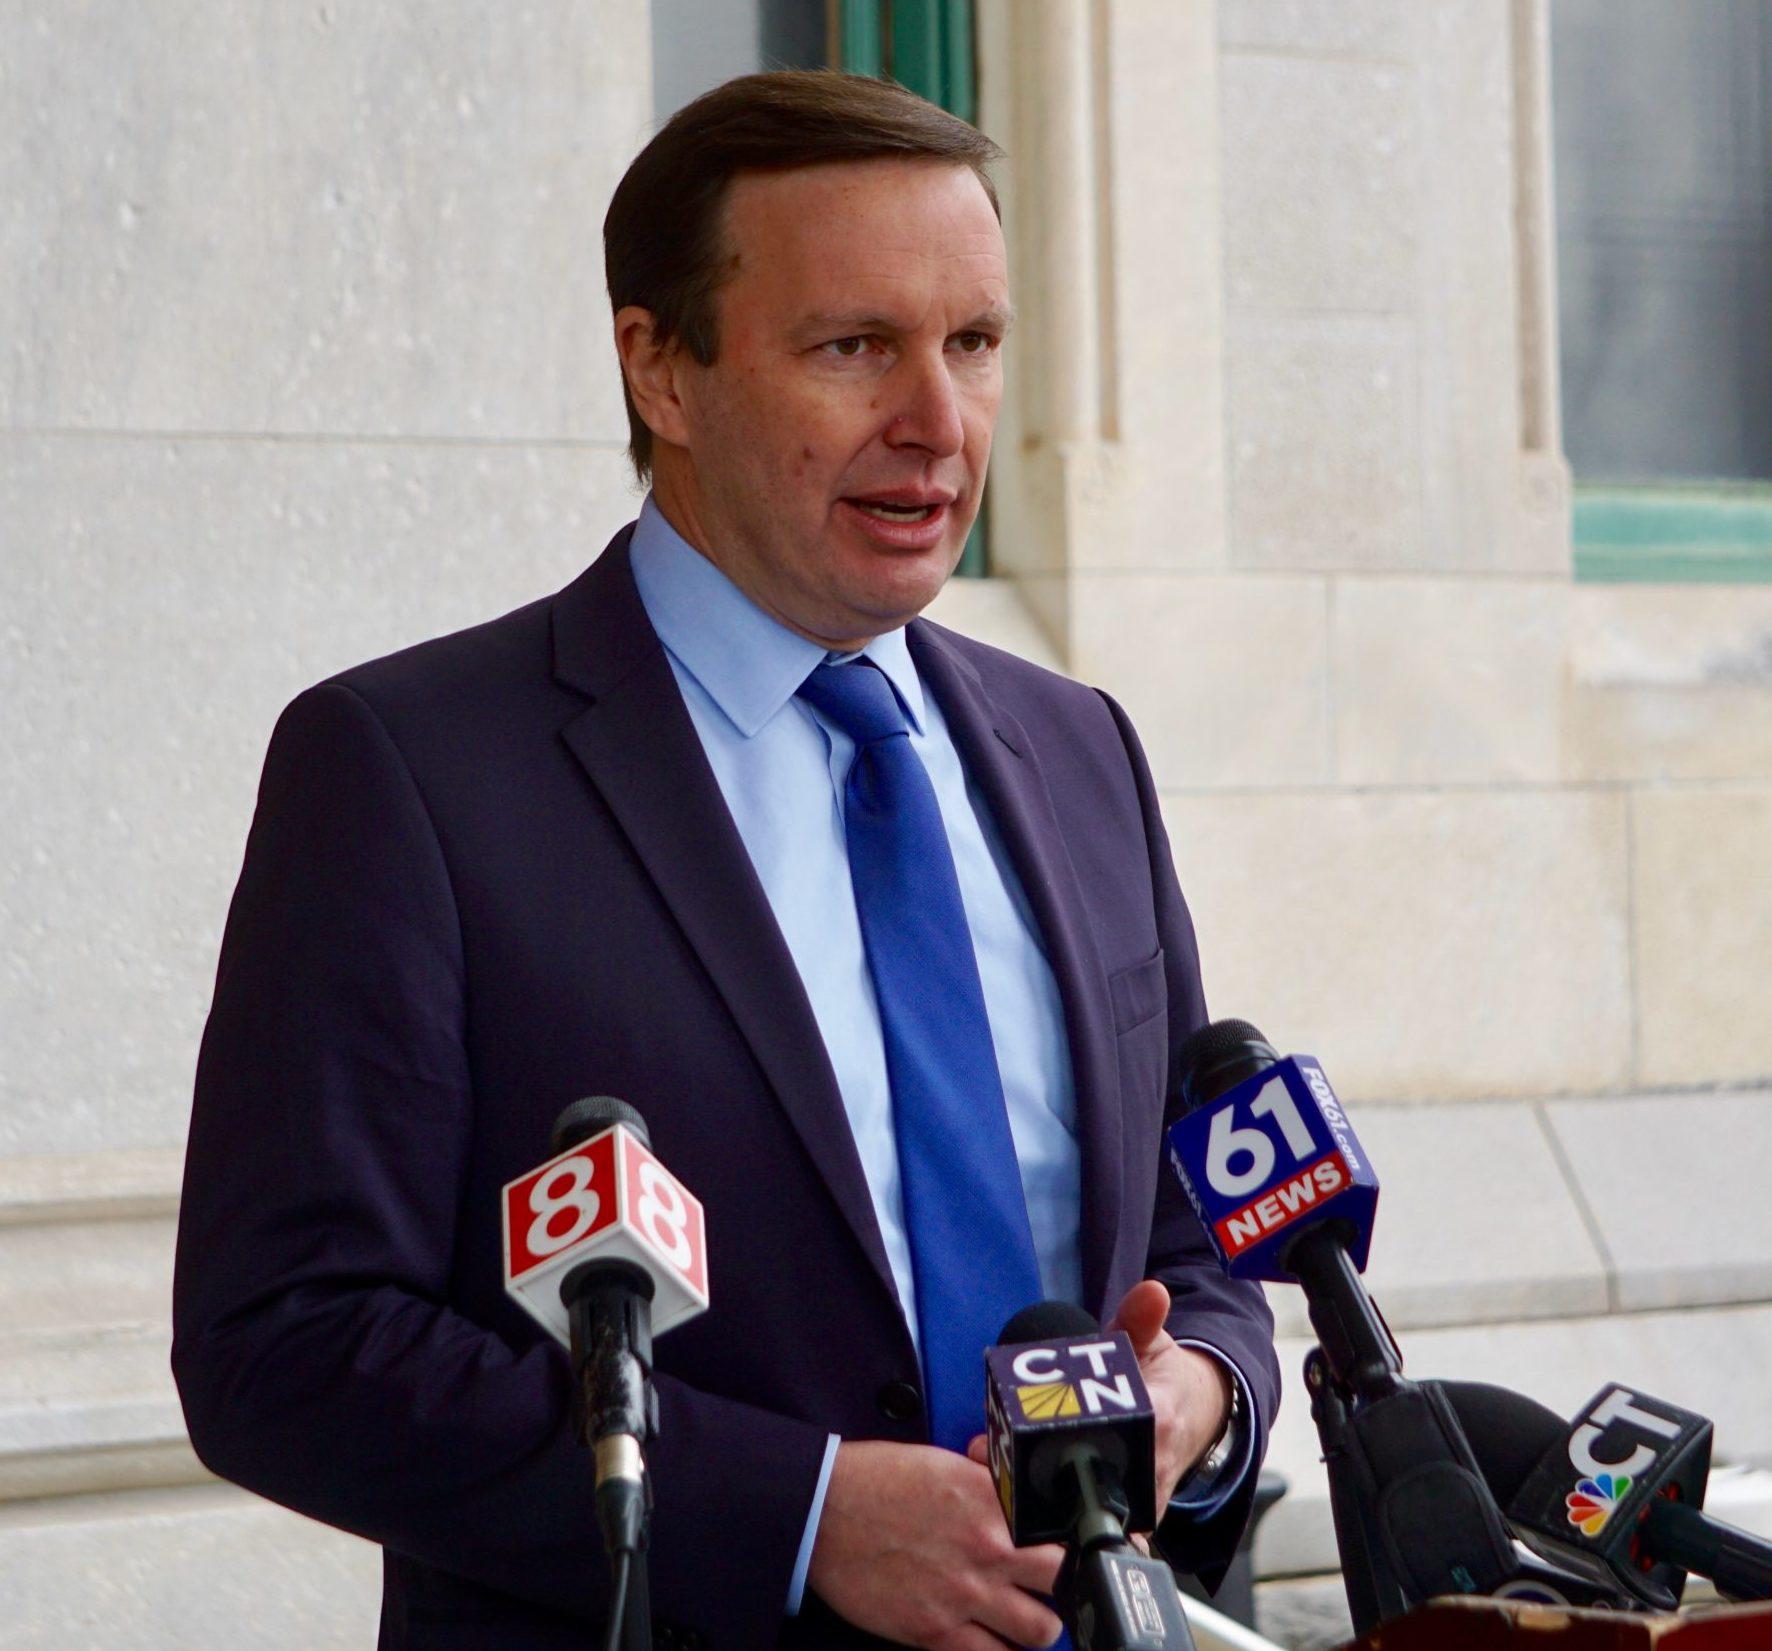 CT Senators say danger of insurrection remains